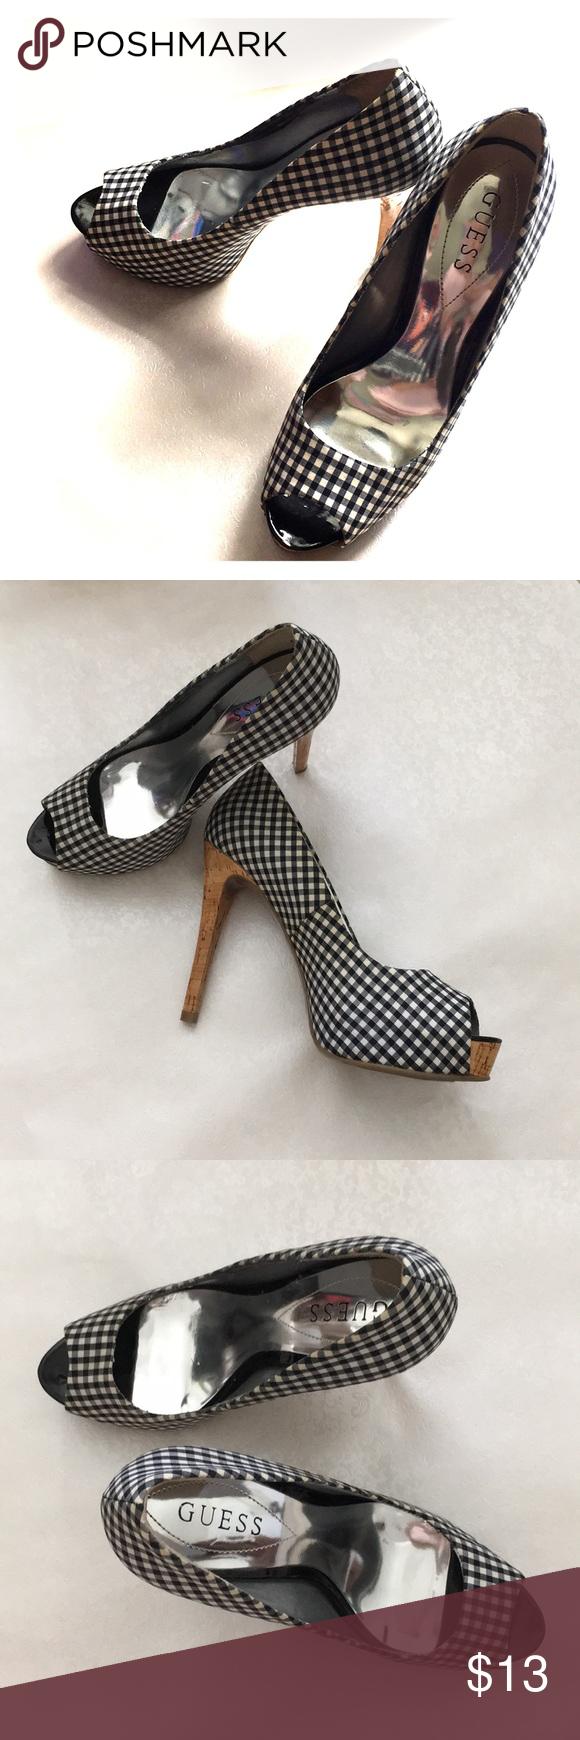 High heels Guess shoes   Heels, Guess